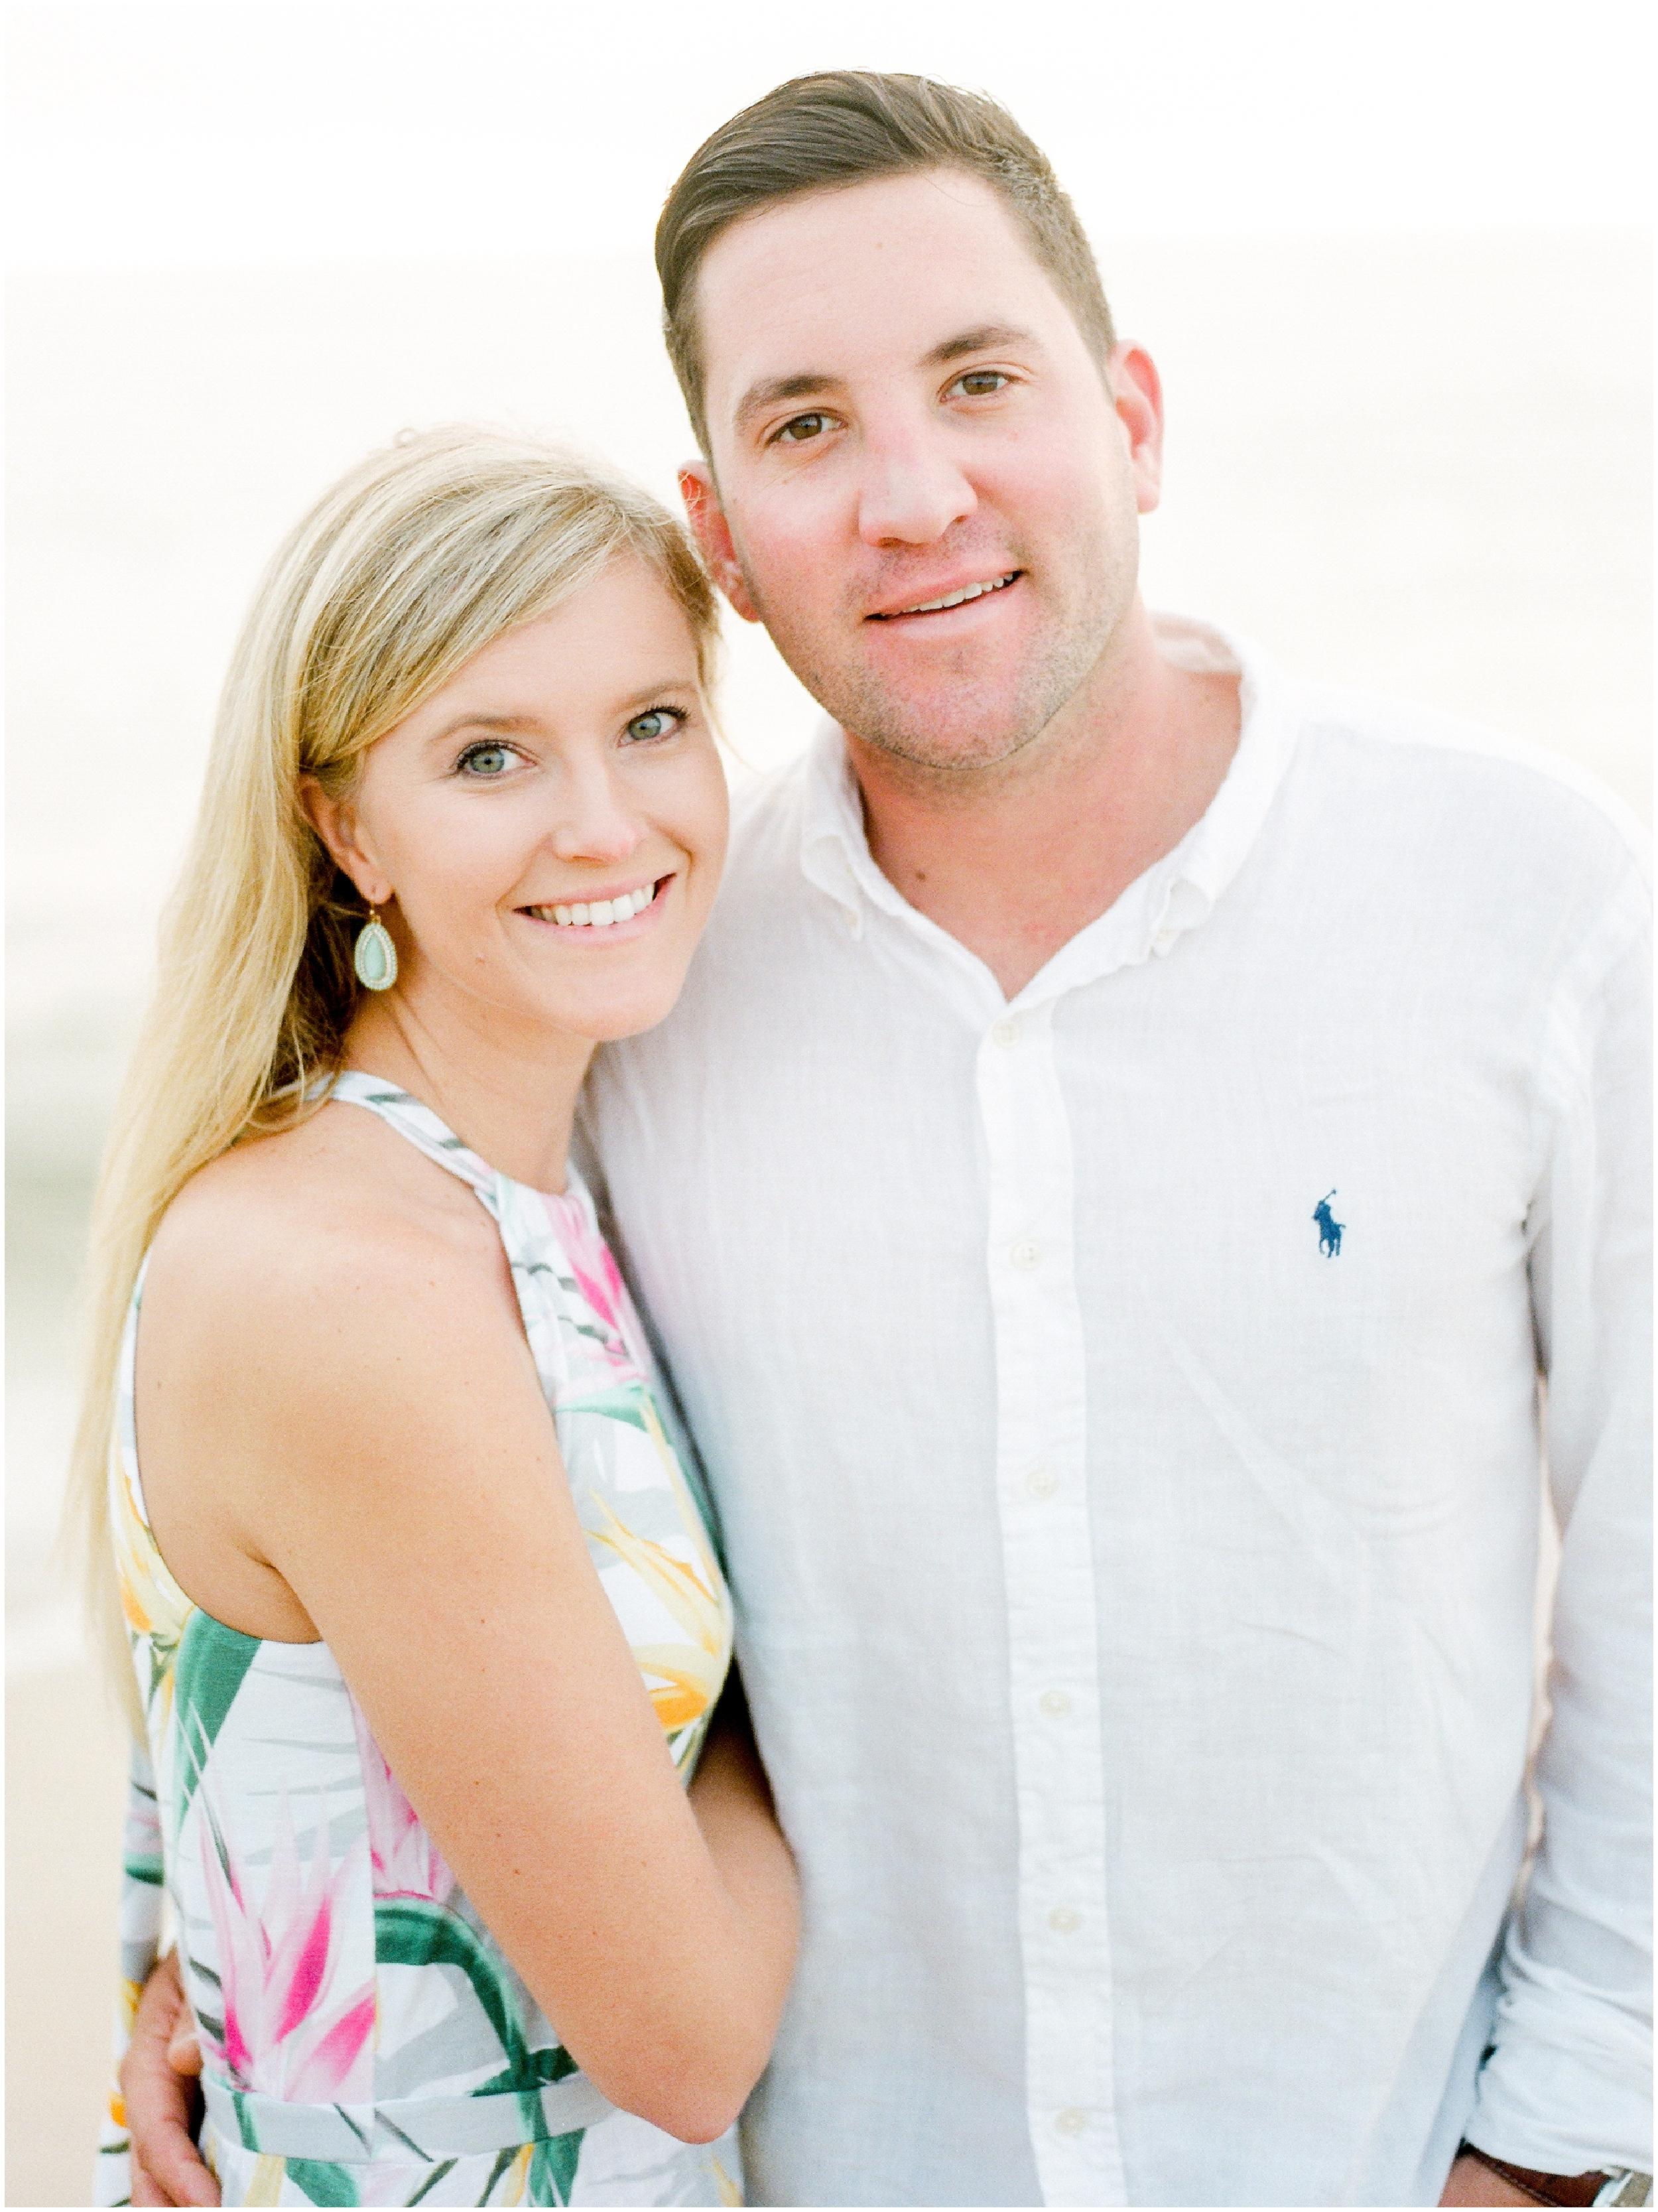 Sunrise Engagement Session at Vilano Beach- Jacksonville, Florida Fine Art Film Wedding Photography_0047.jpg